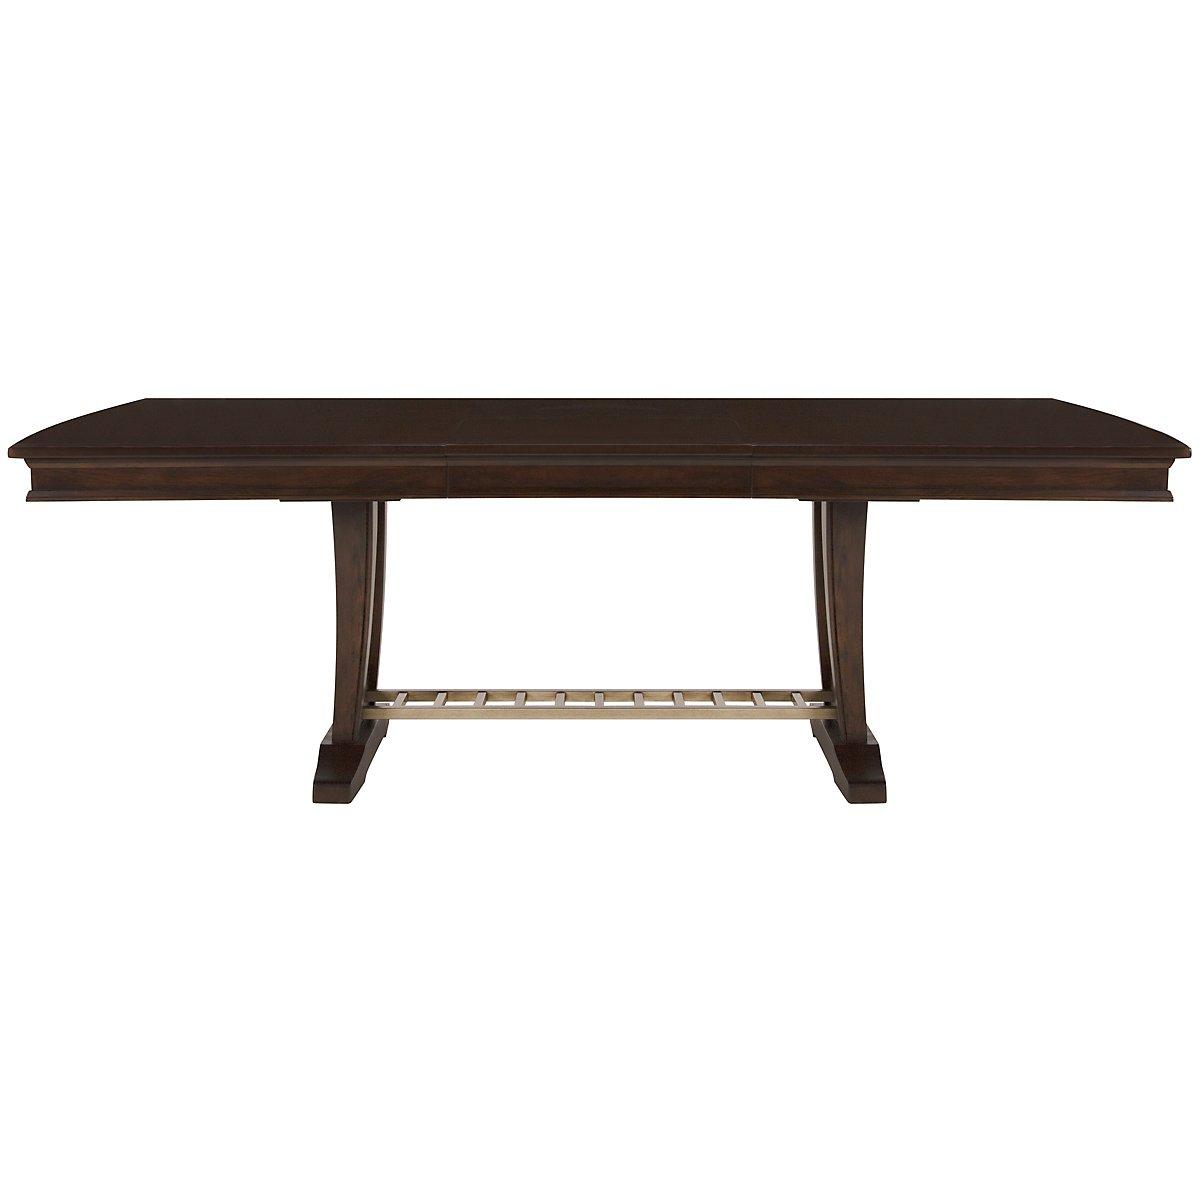 Canyon Dark Tone Trestle Table